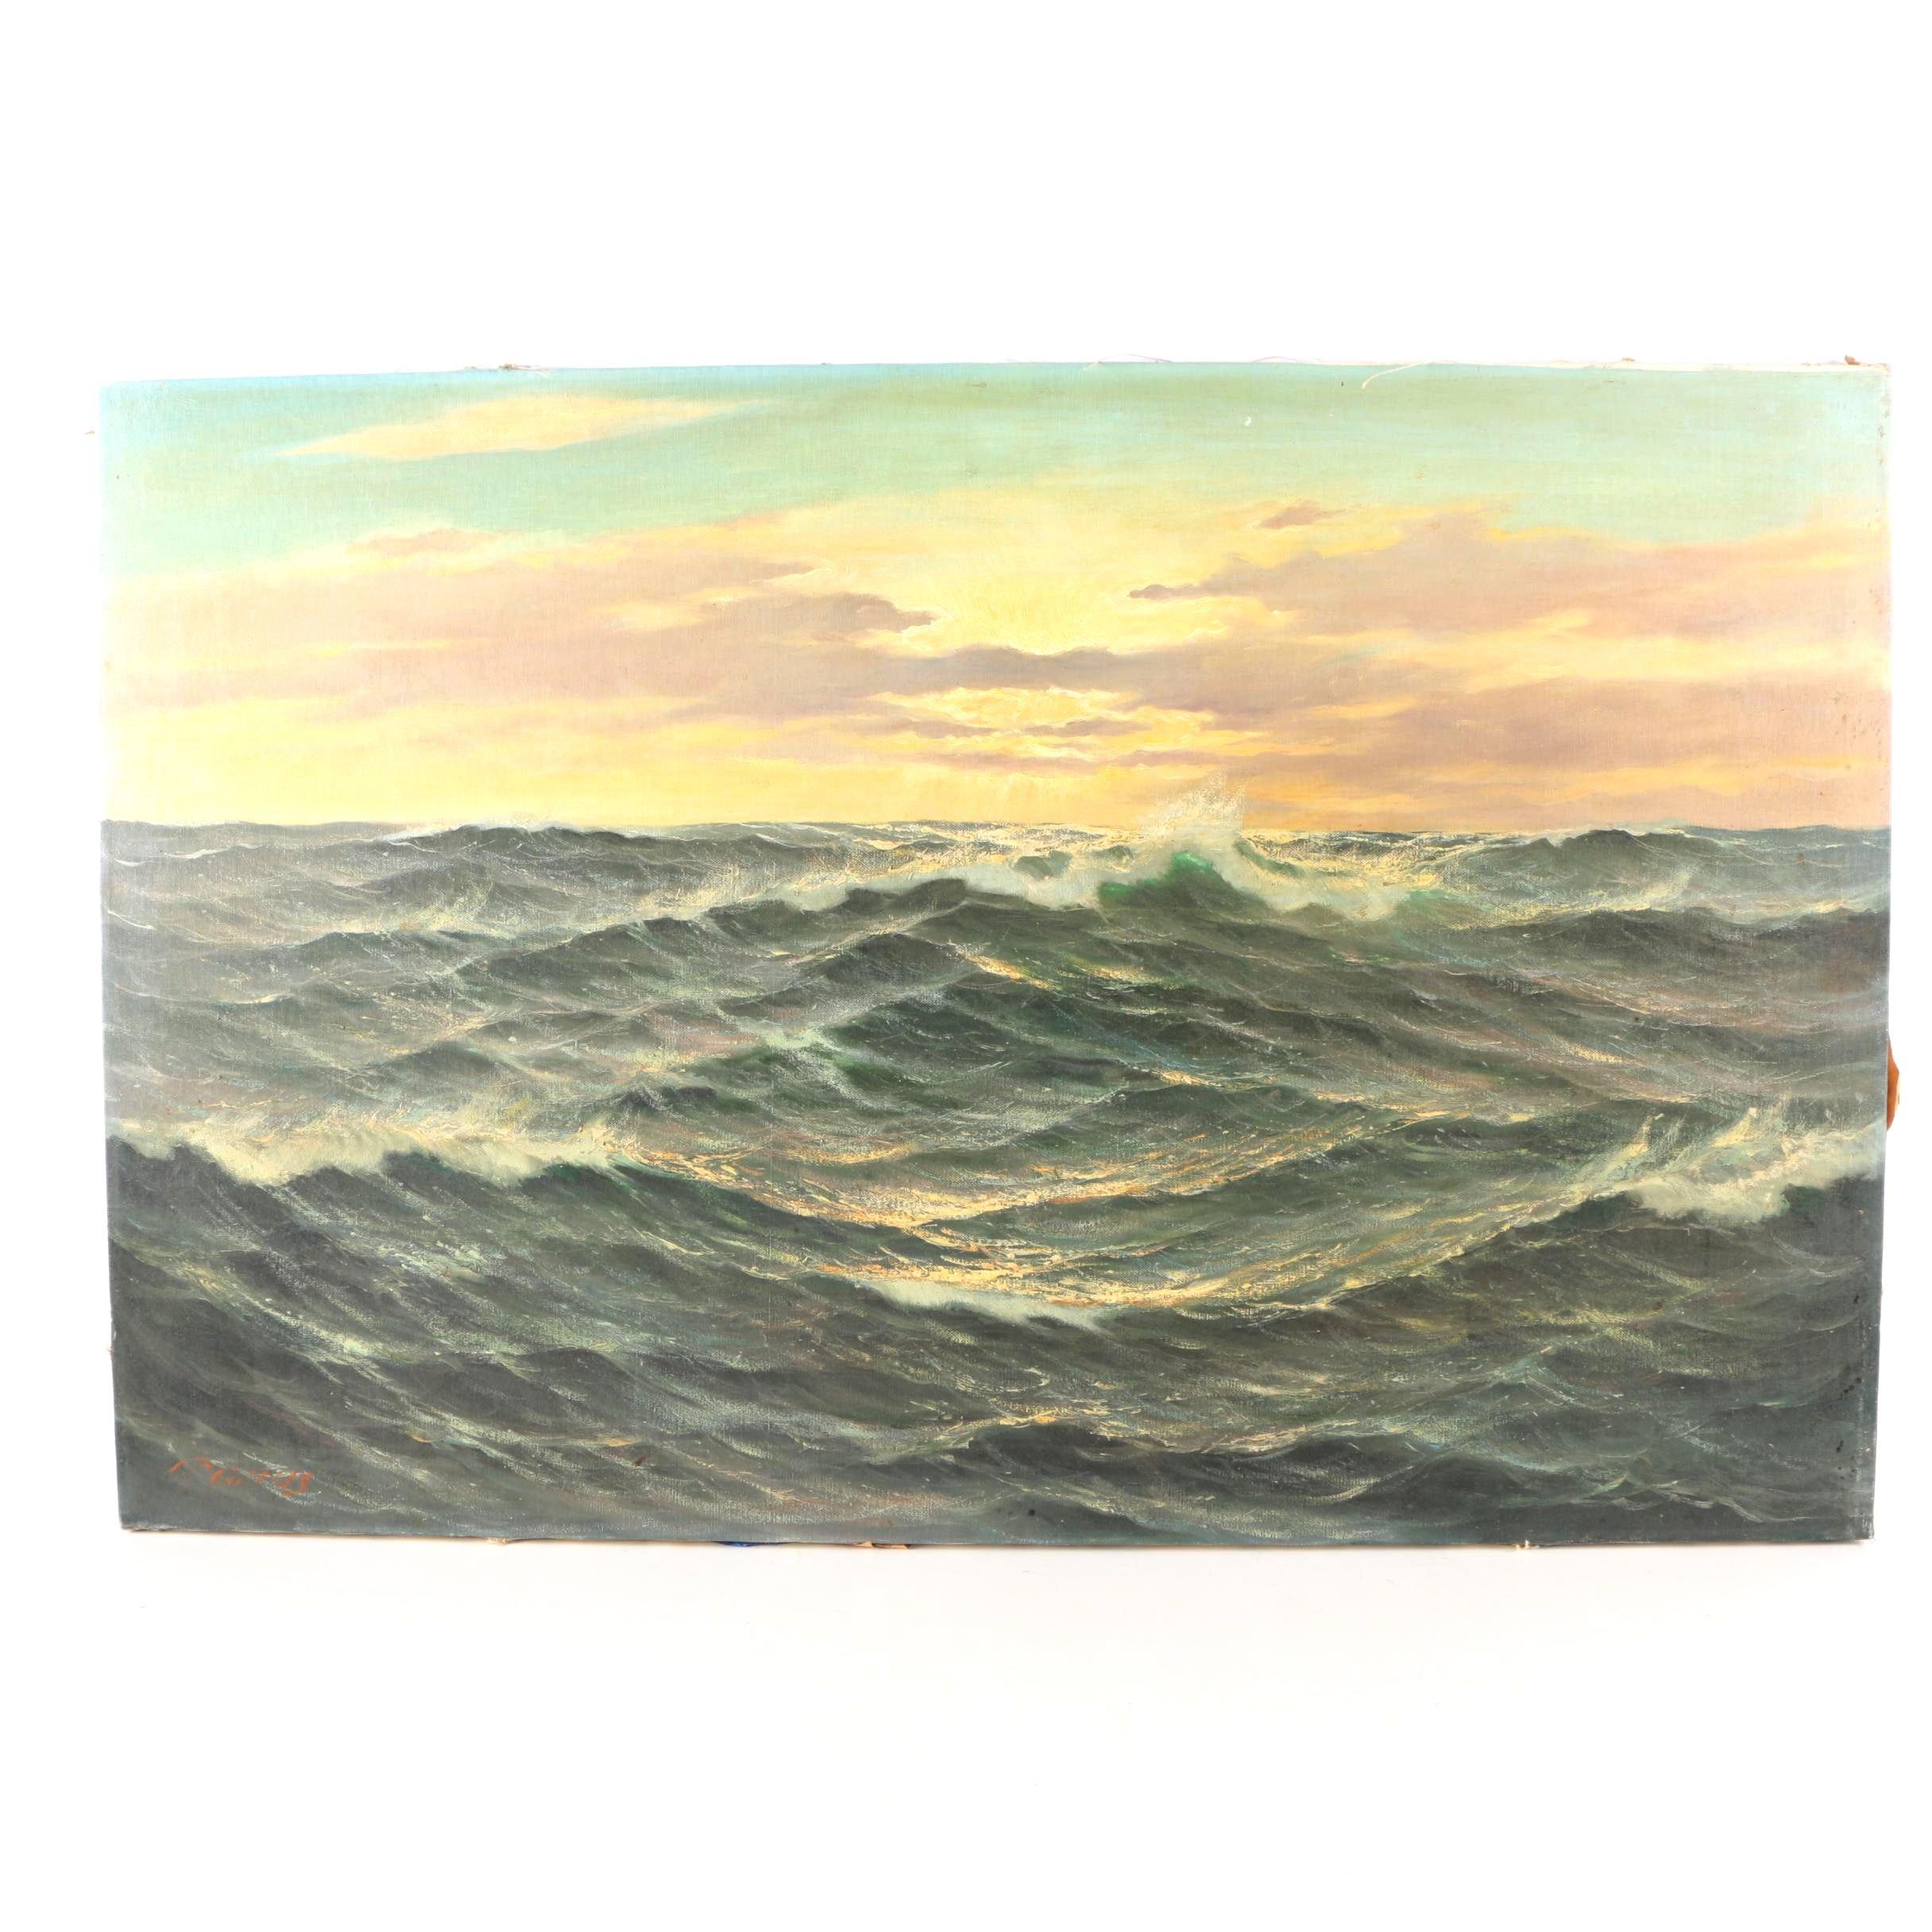 P. Marais Oil Painting on Canvas Seascape